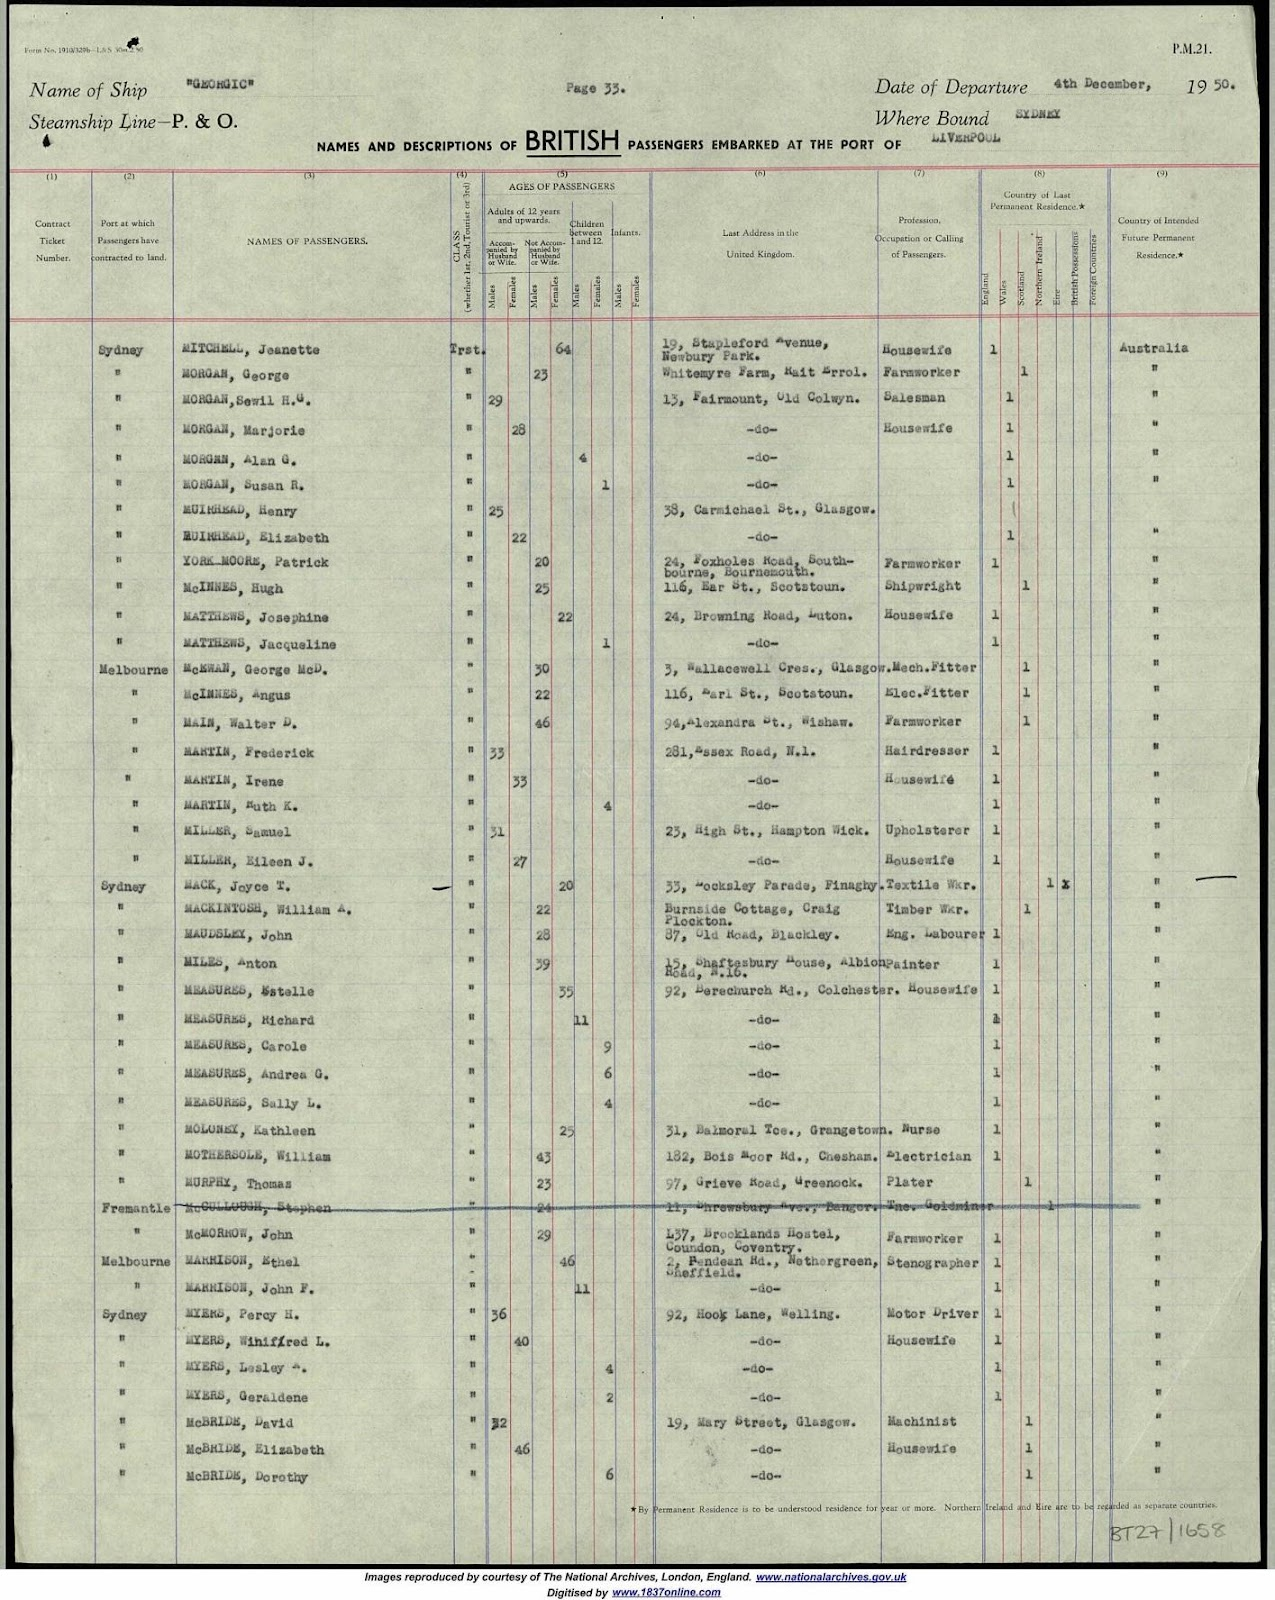 C:\Users\Main user\Documents\Ancestry\Dadaji\Anton Ships\Anton Miles Passage to Australia 1950 Original.jpg